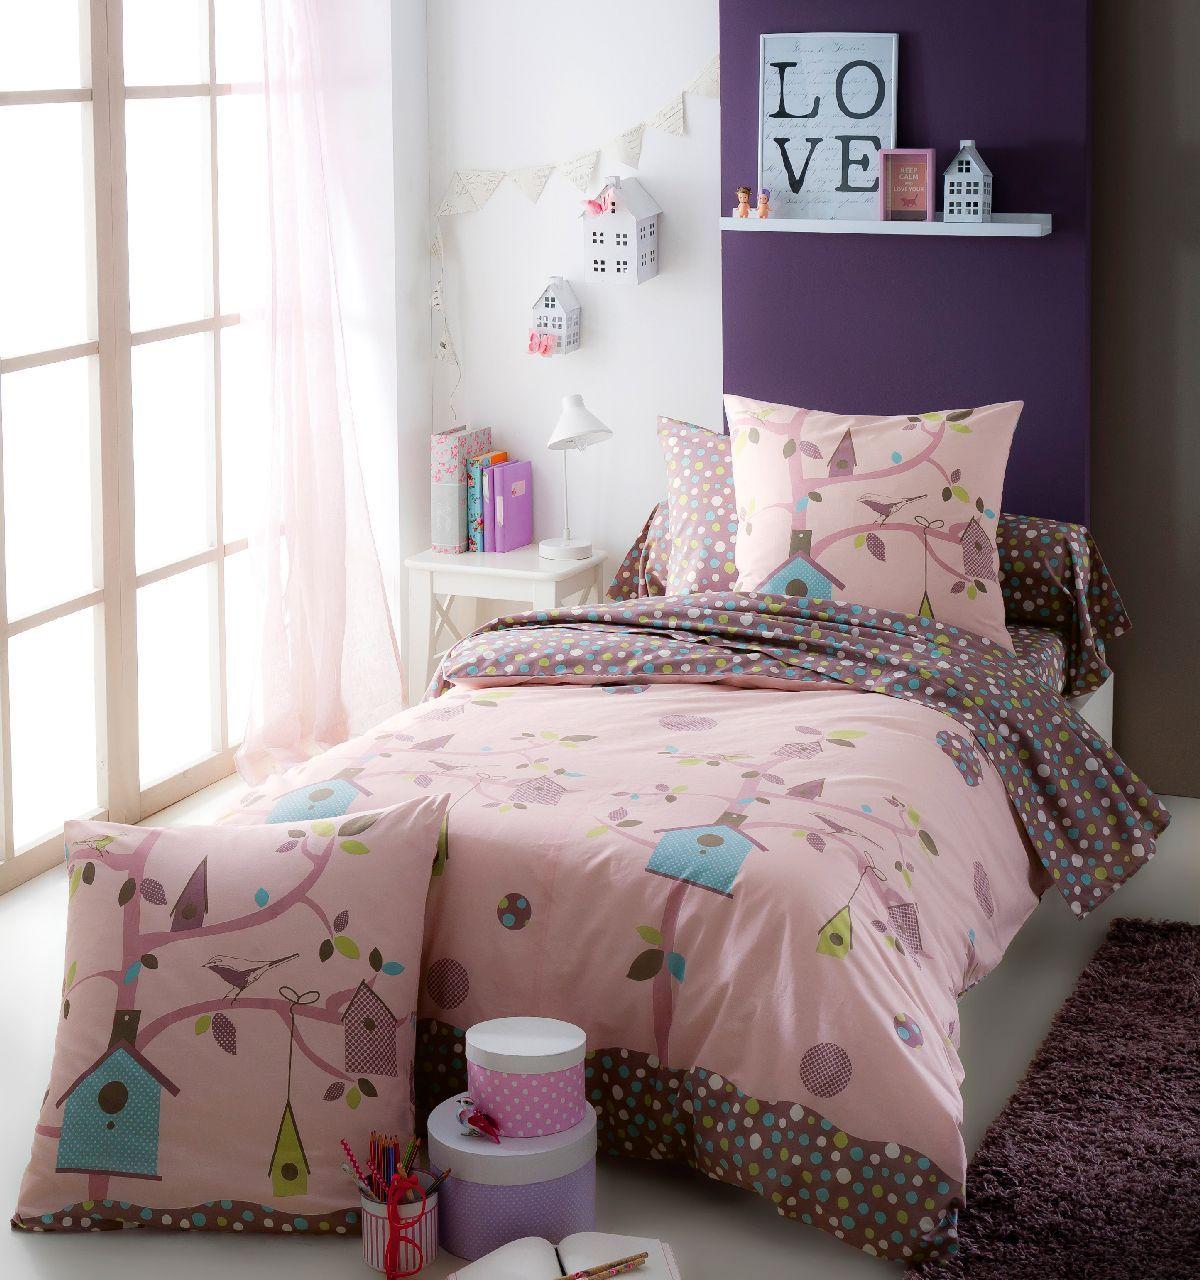 drap housse fauvette 90x190 tradilinge. Black Bedroom Furniture Sets. Home Design Ideas